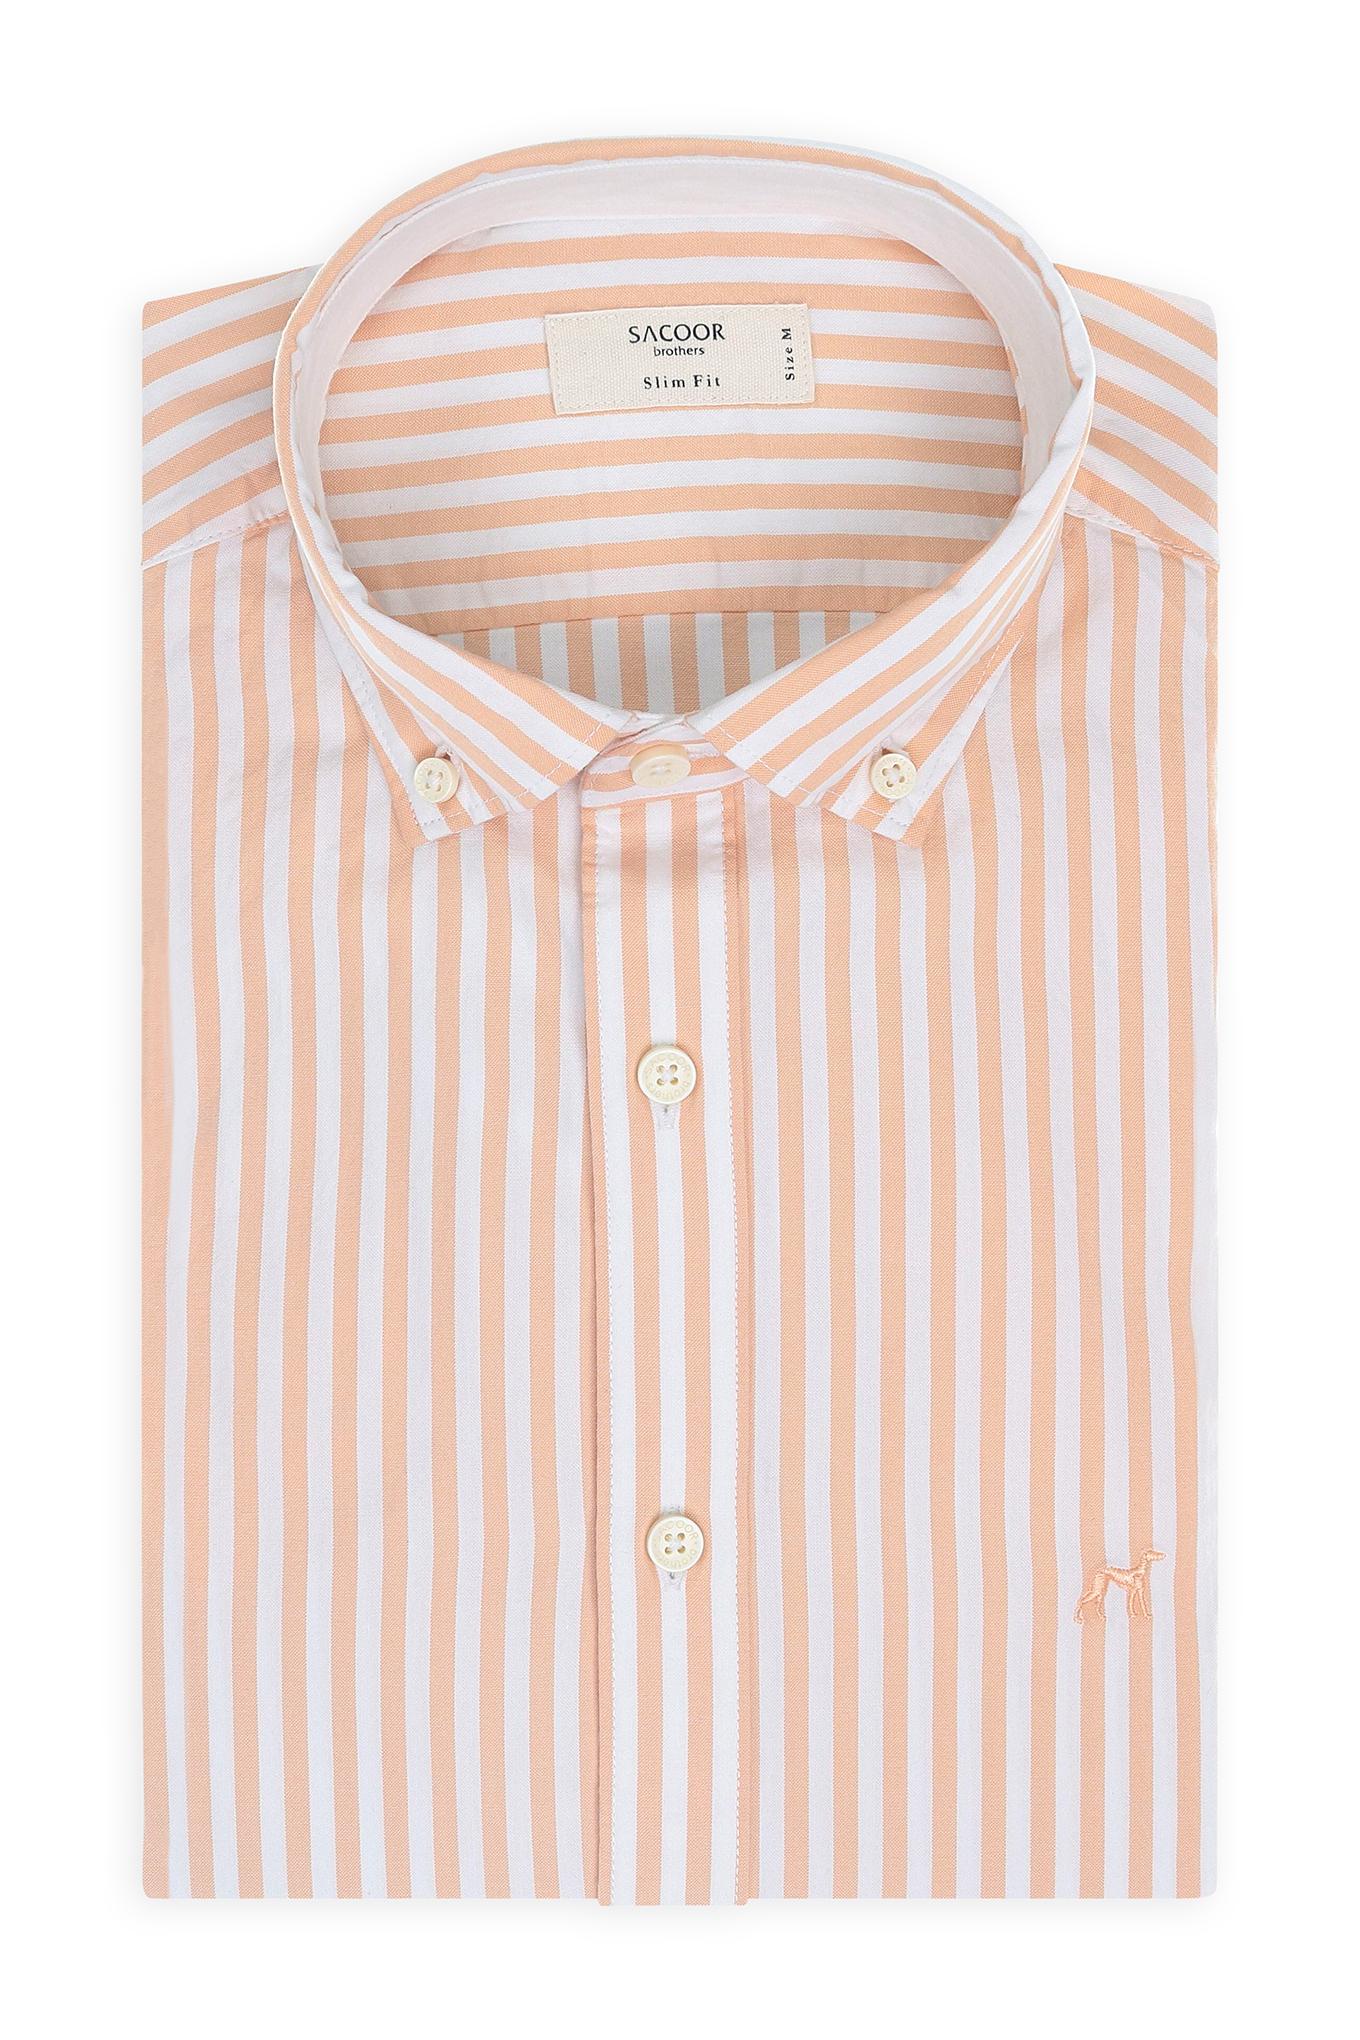 Shirt Light Orange Casual Man